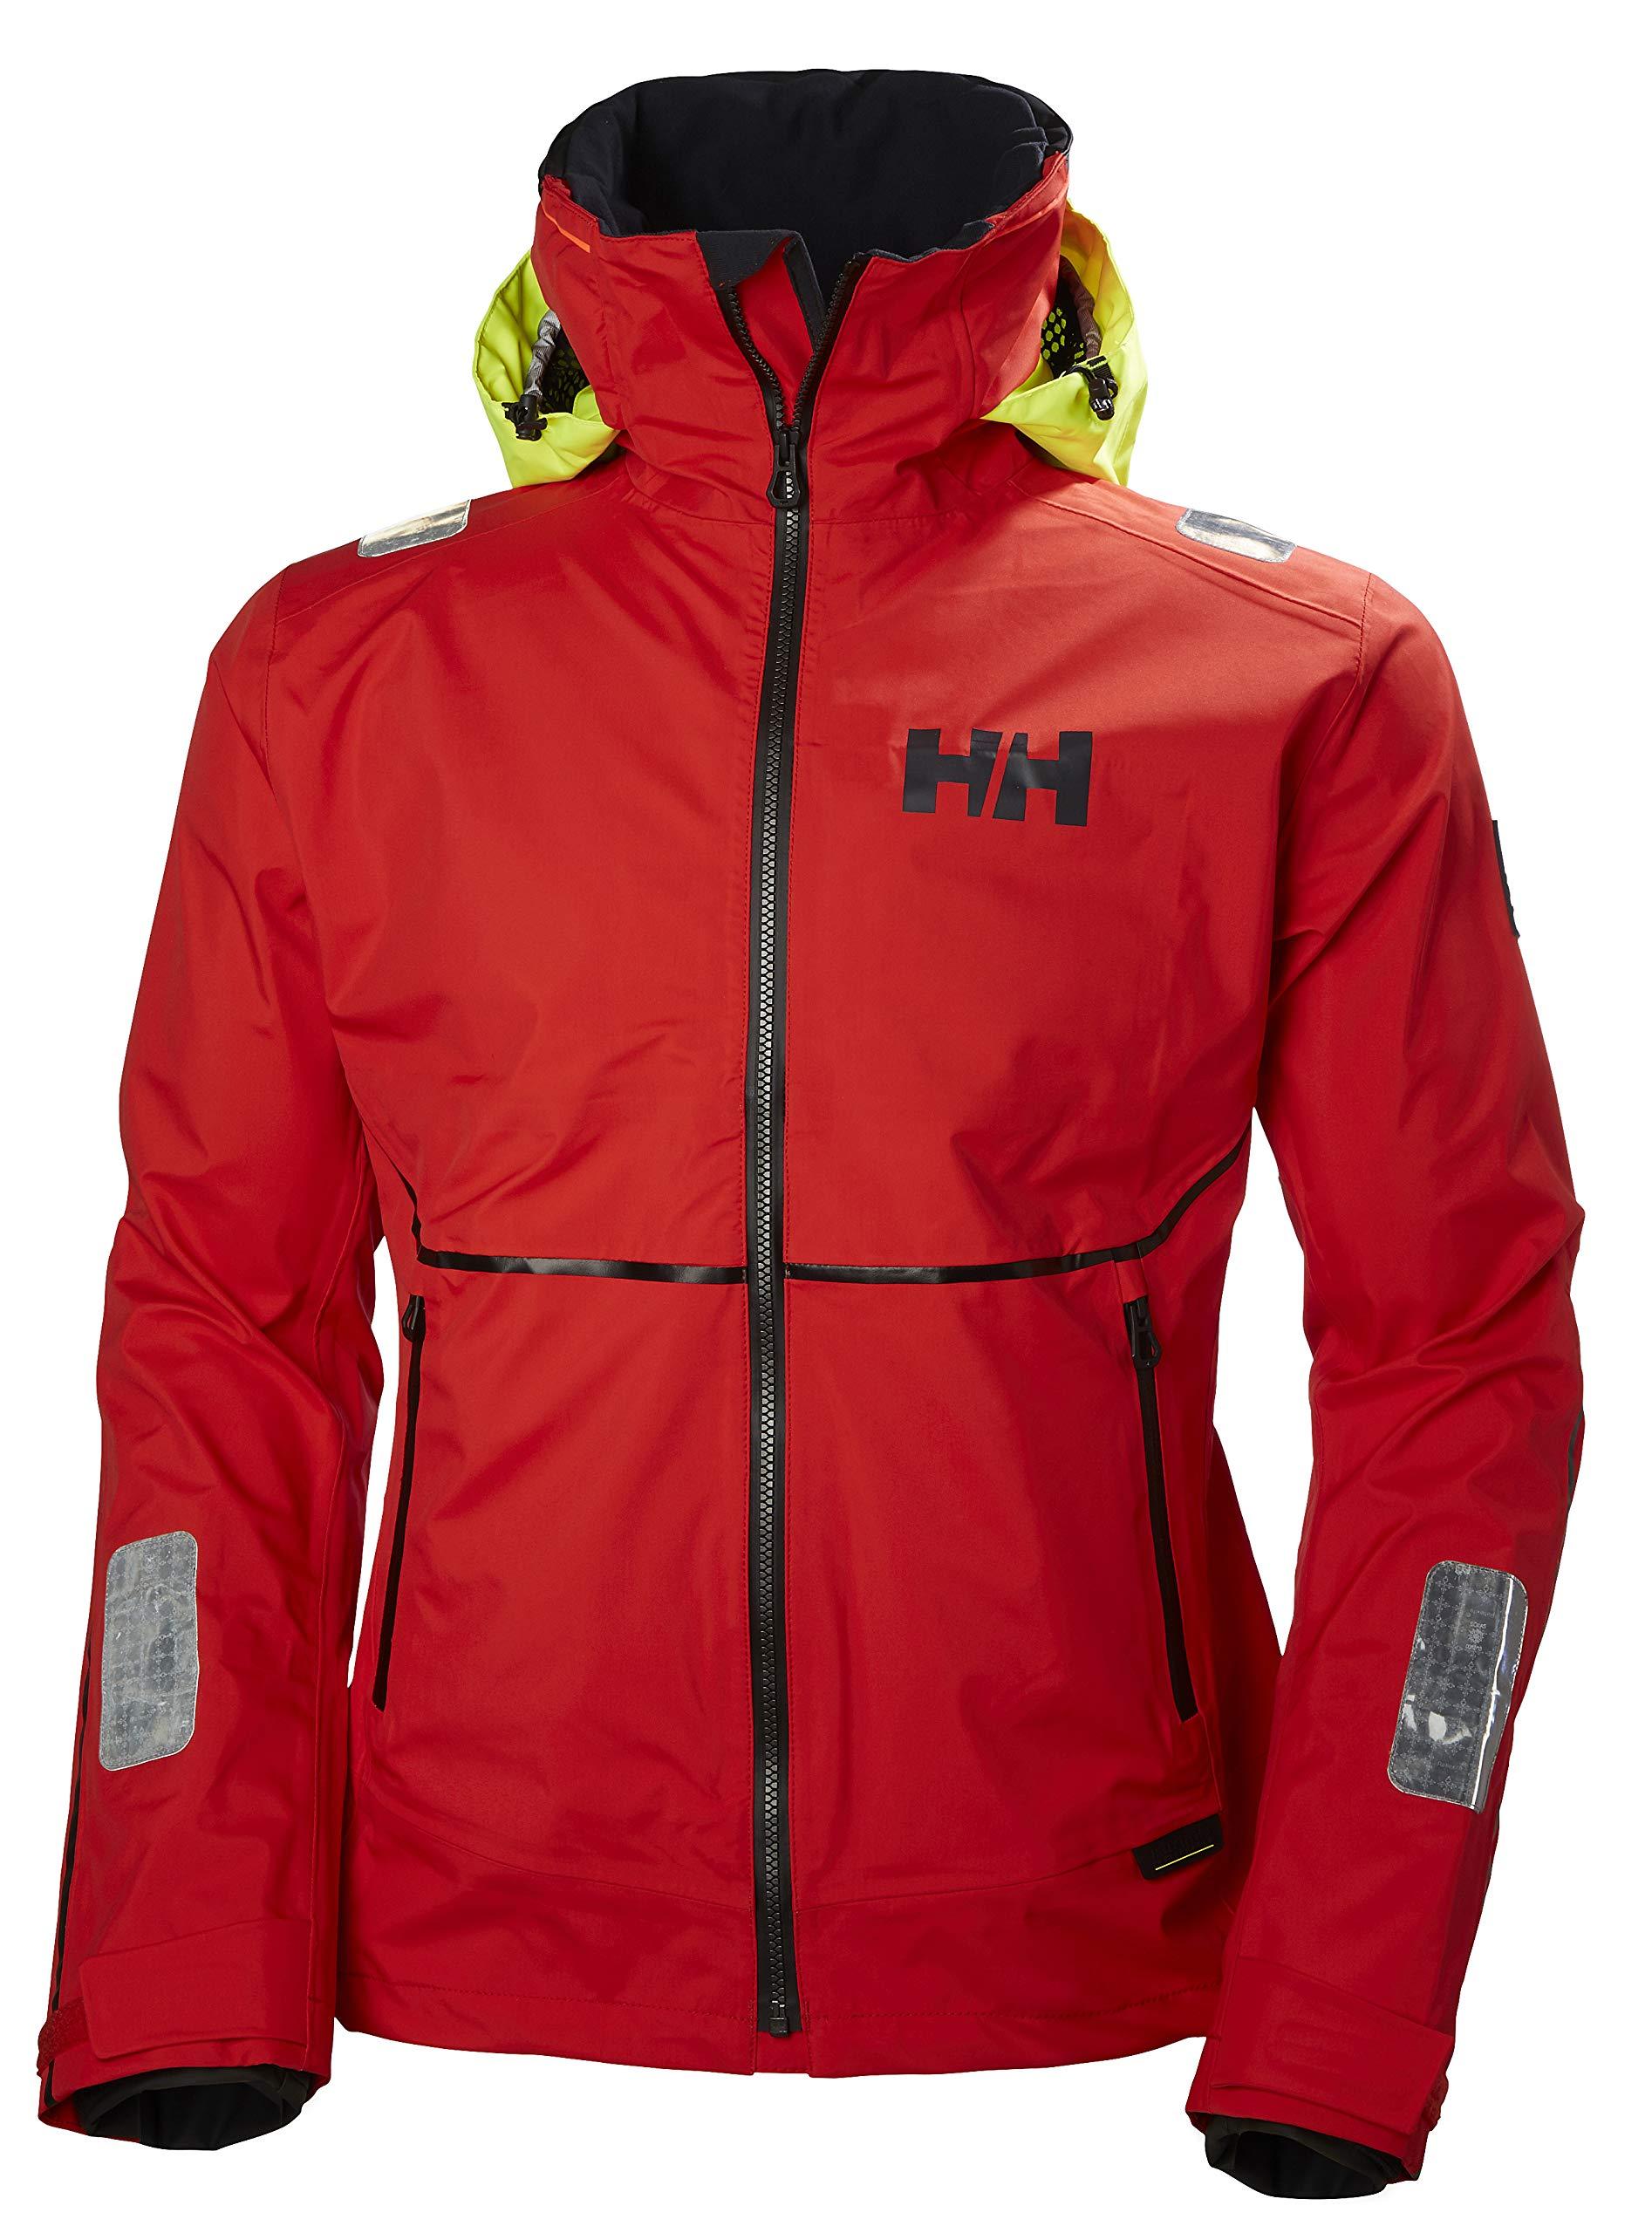 Helly Hansen Men's Hp Foil Waterproof Breathable Hooded Sailing Jacket, Alert Red, Small